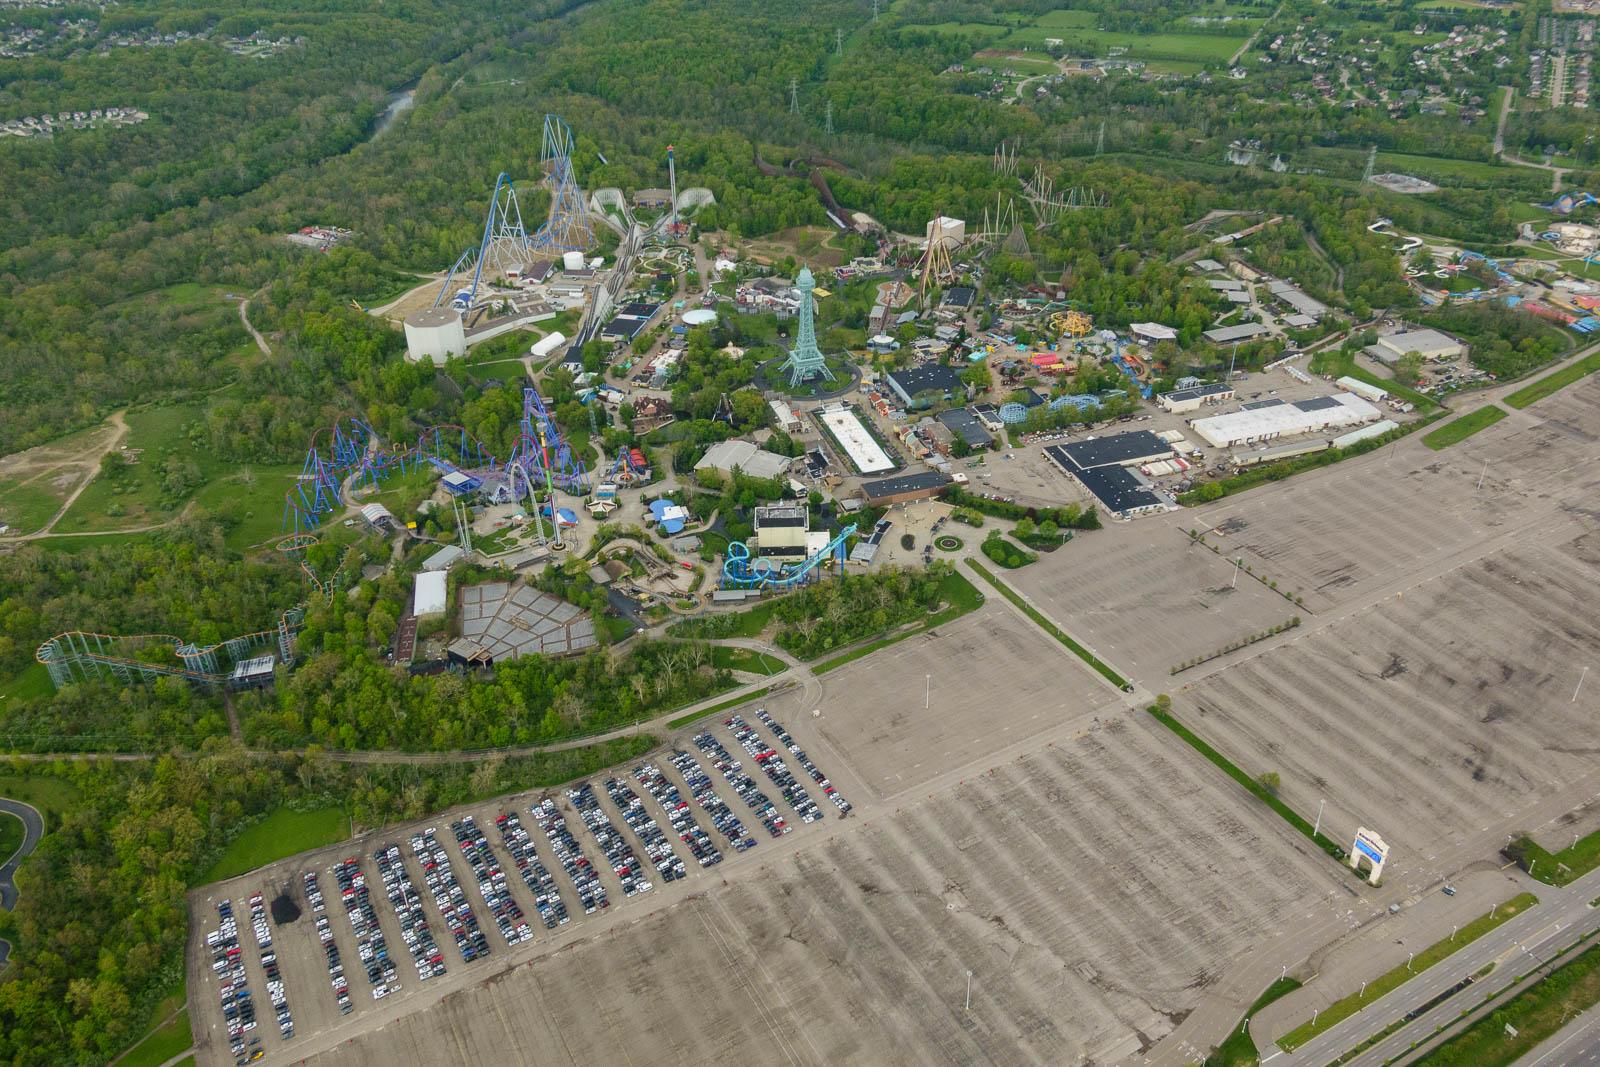 King's Island theme park in Mason - empty due to COVID-19